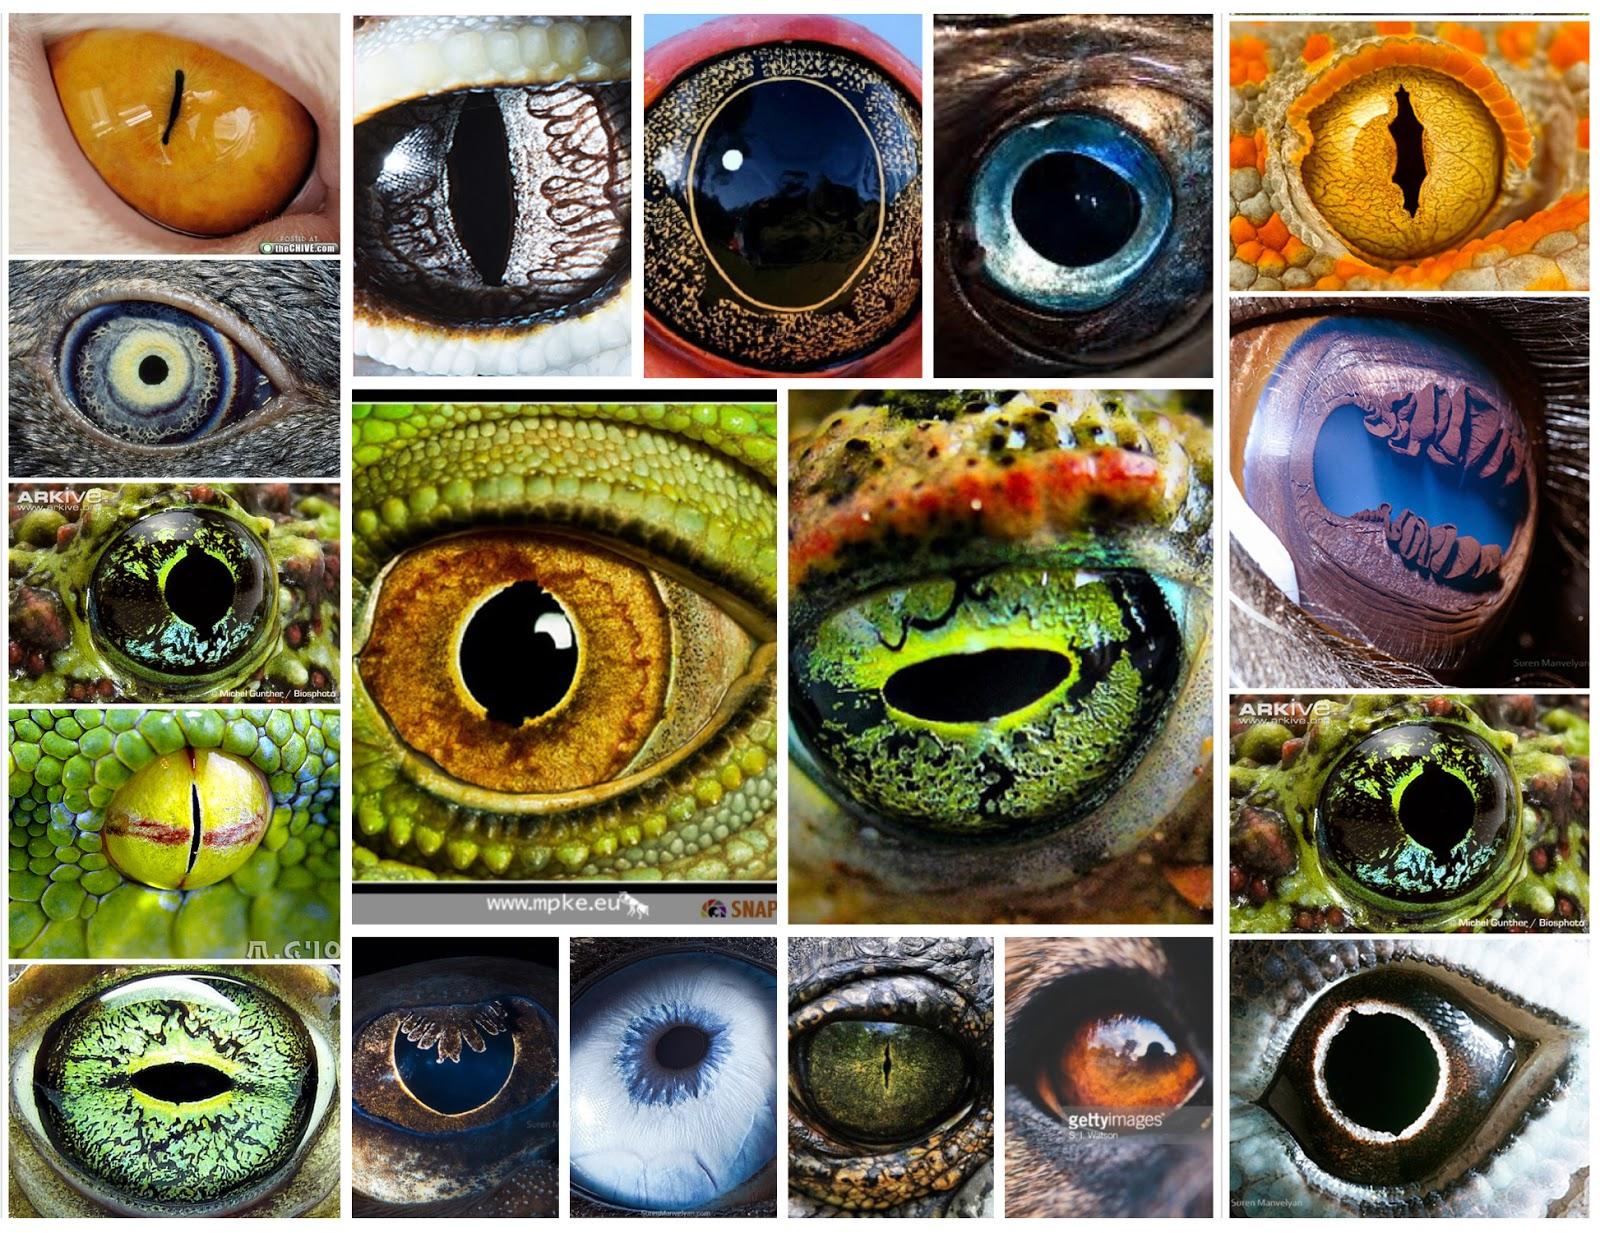 eyes animal eye nature series eyeballs interesting divine retina window imagination indulge listen says heart through these